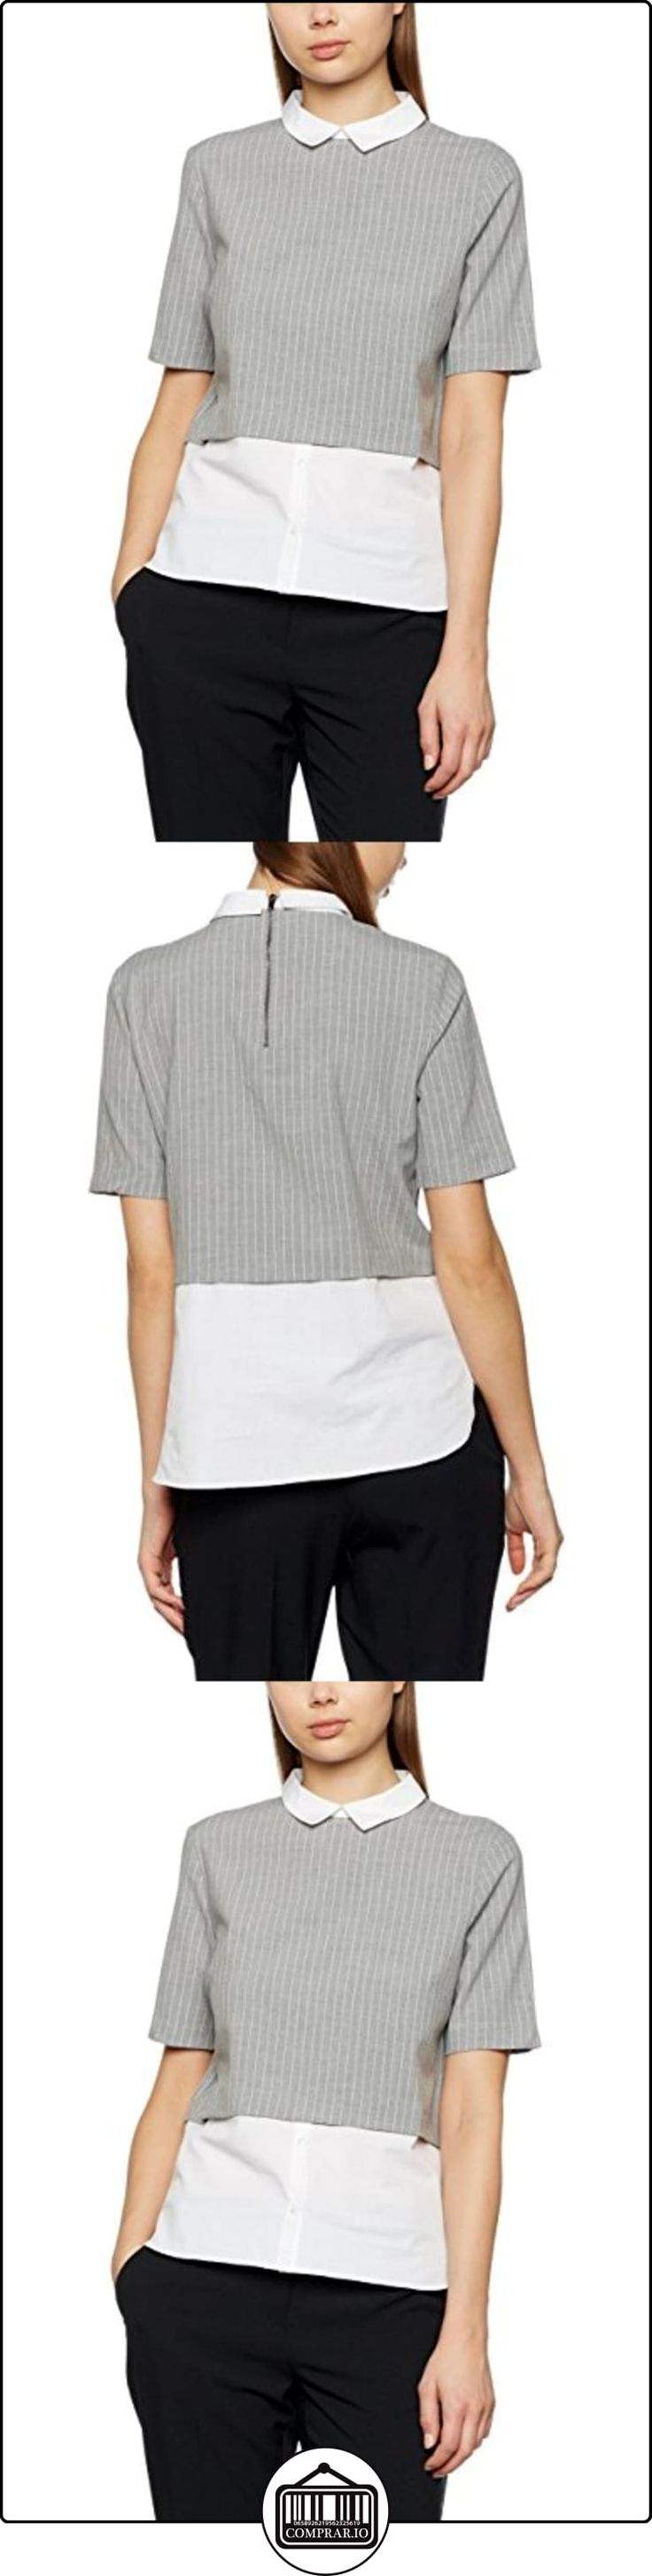 Mexx Women Blouse Short Sleeve, Blusa para Mujer, Grau (Wet Weather Melange 162), Medium  ✿ Blusas y camisas ✿